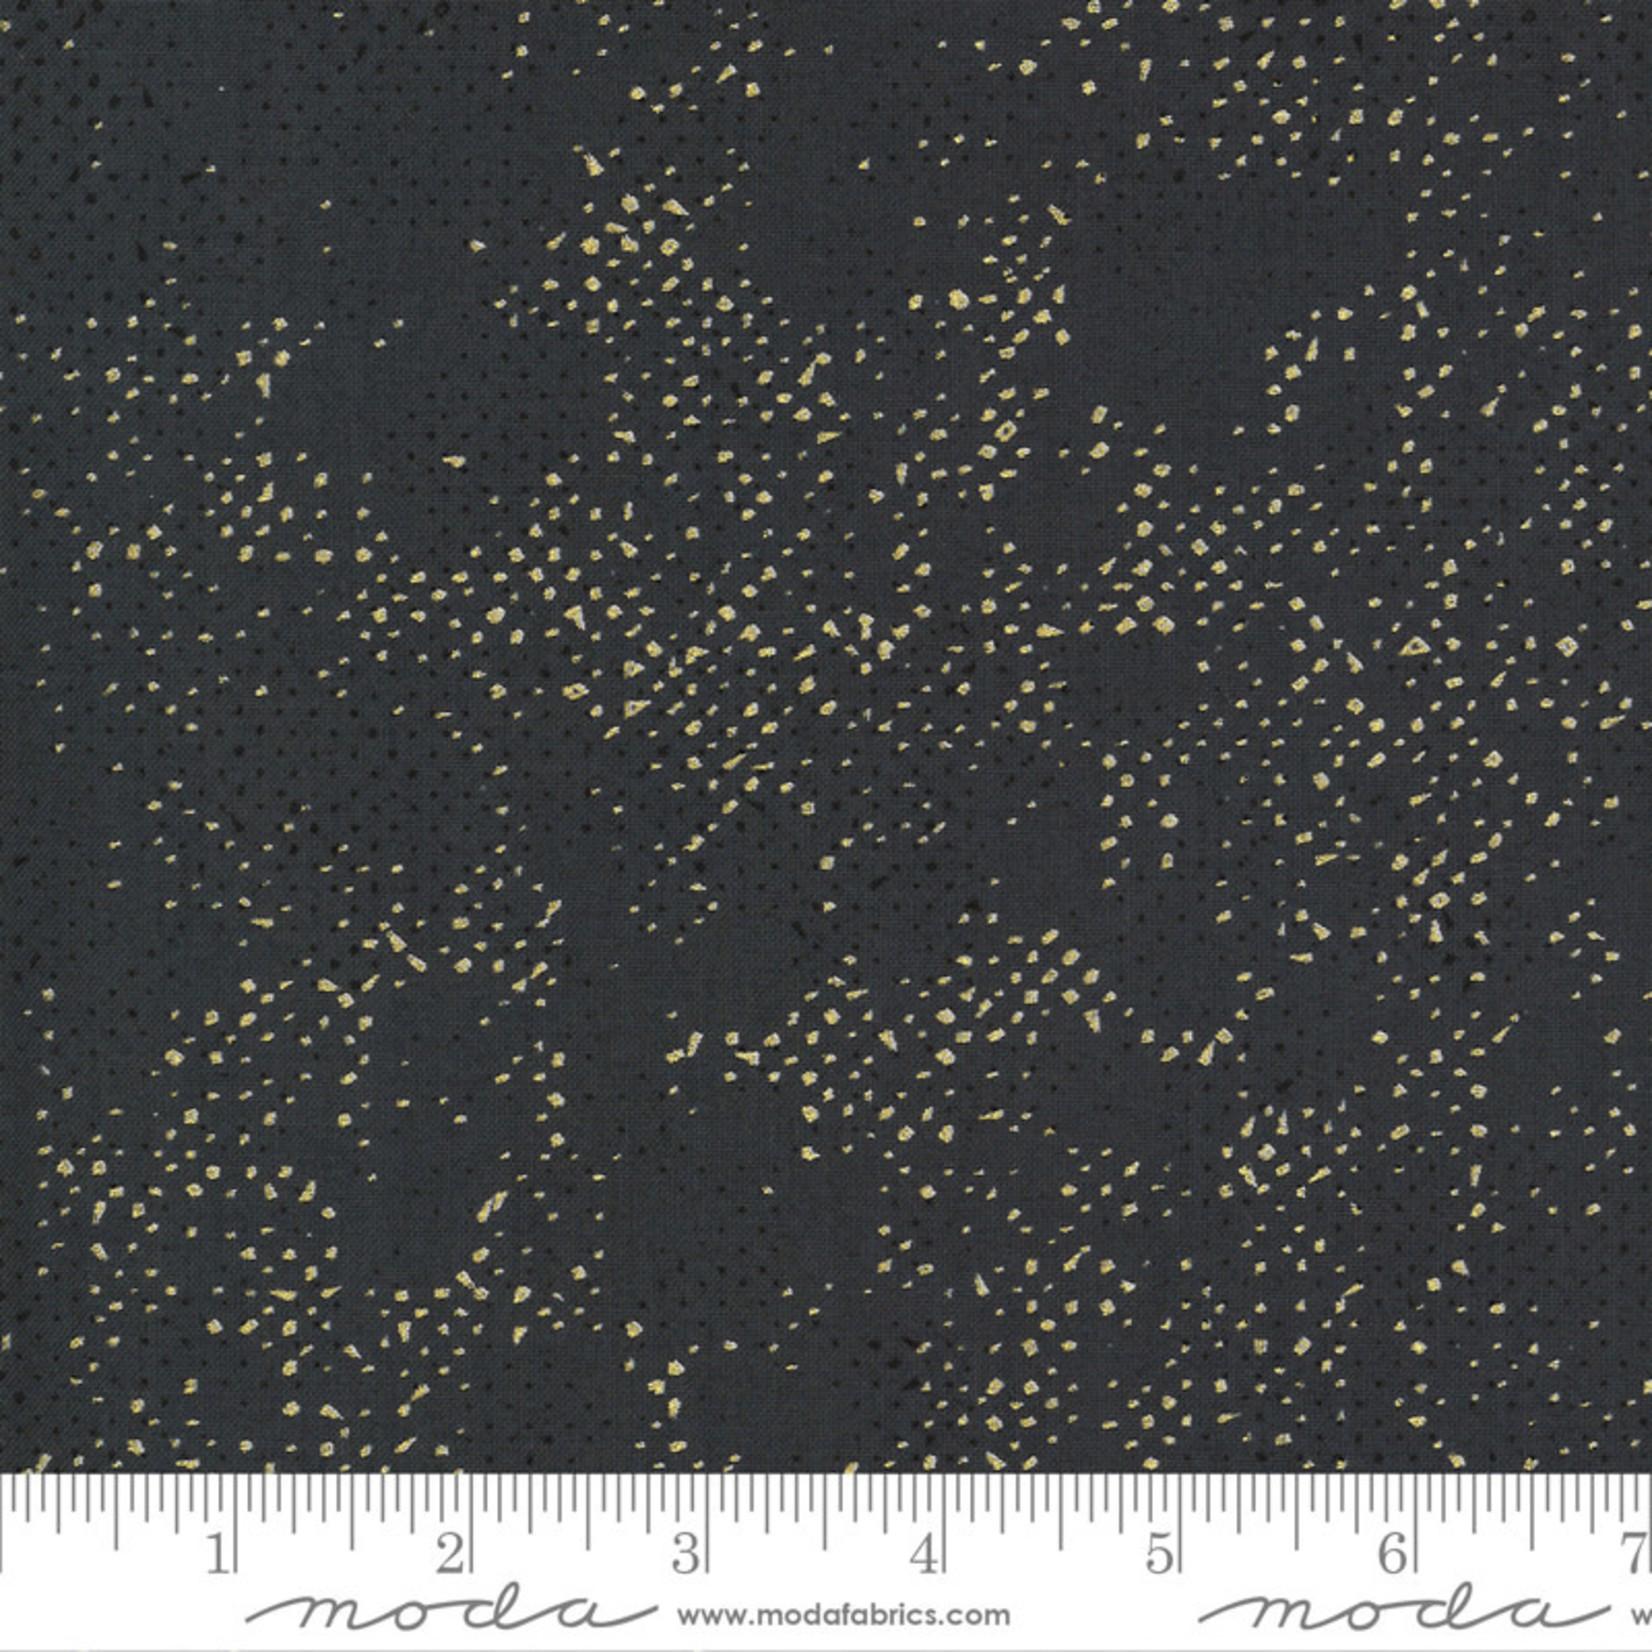 Zen Chic Dance in Paris, Dots Spotted, Coal Metallic (1660 160M) $0.21 per cm or $21/m